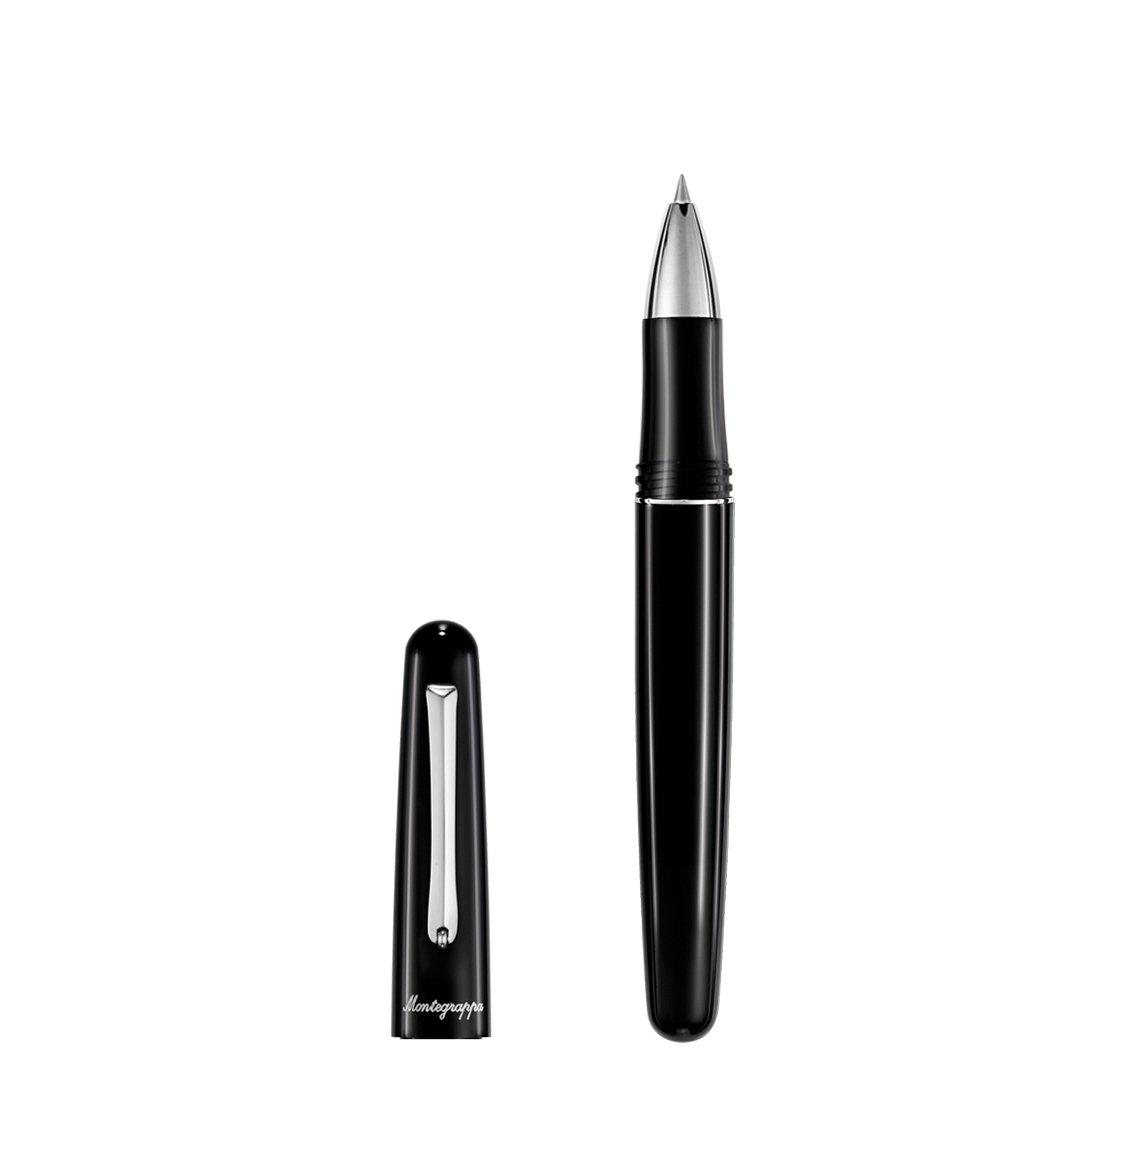 Montegrappa Στυλό Υγρής Μελάνης Elmo 01 Rollerball Pen Black